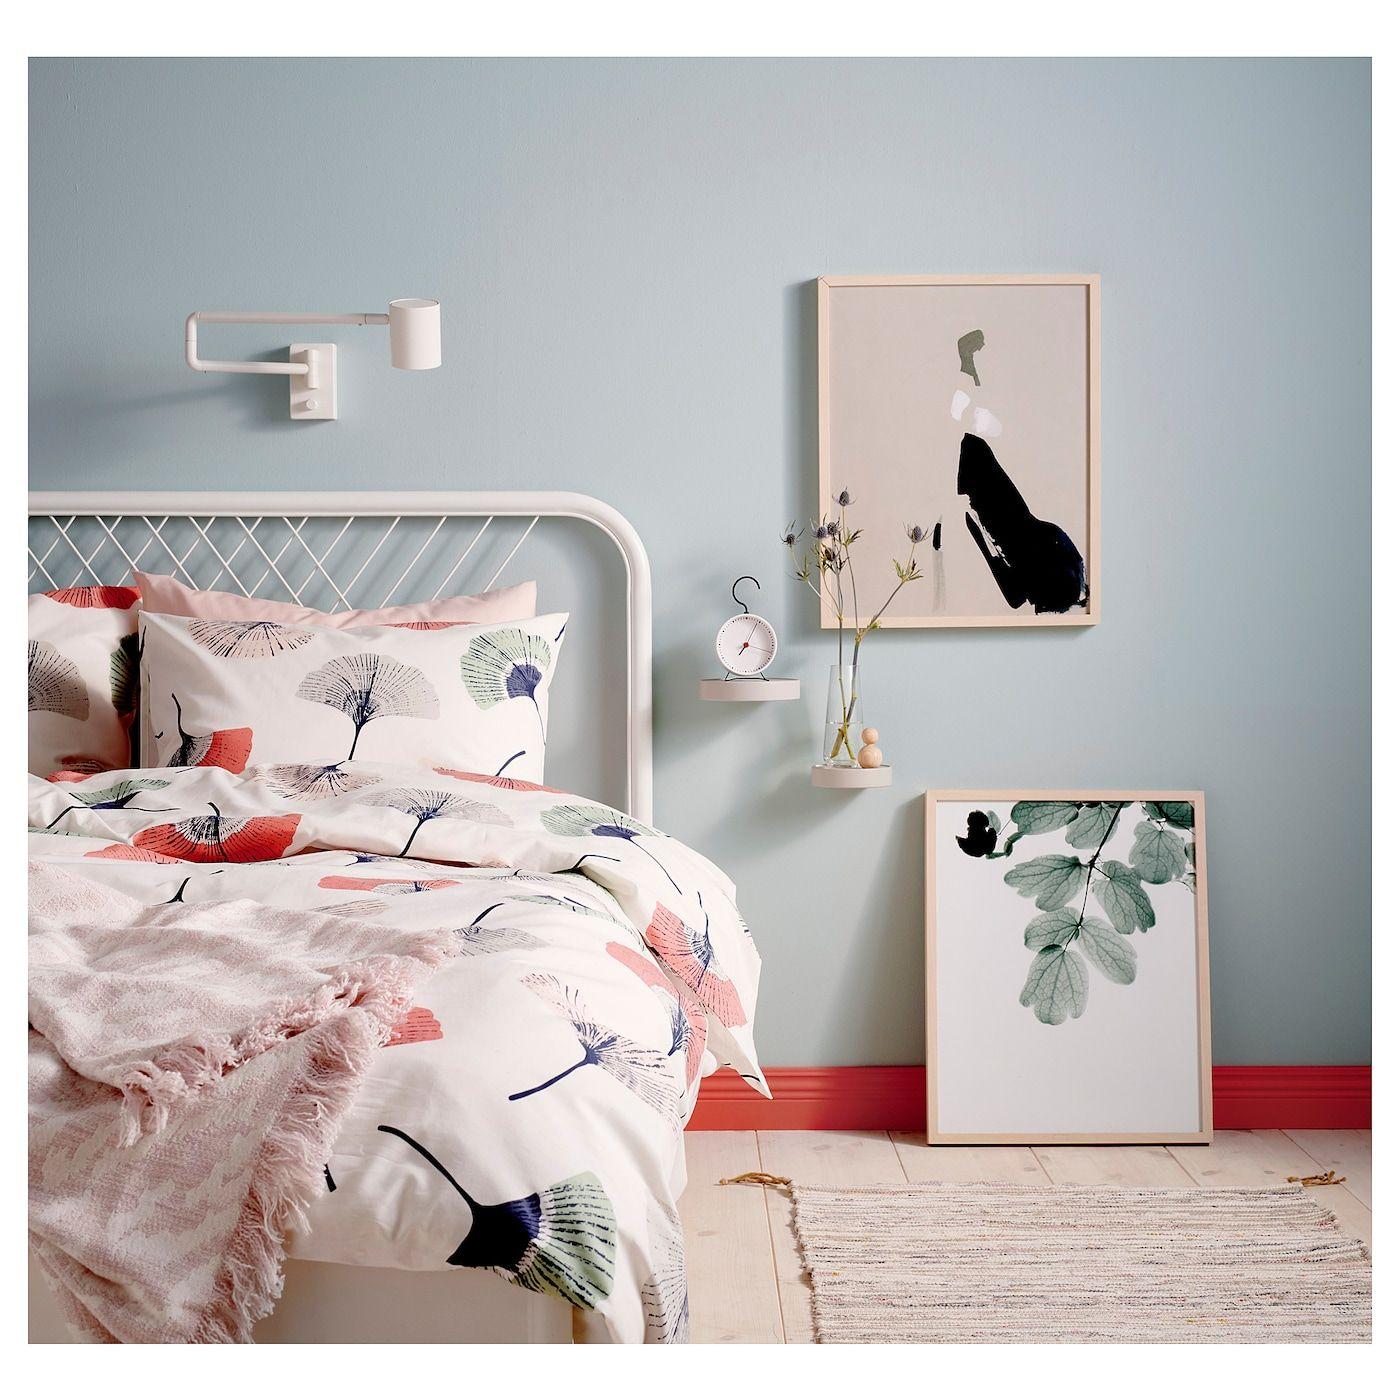 NESTTUN Bed frame white, Luröy IKEA in 2020 Bed